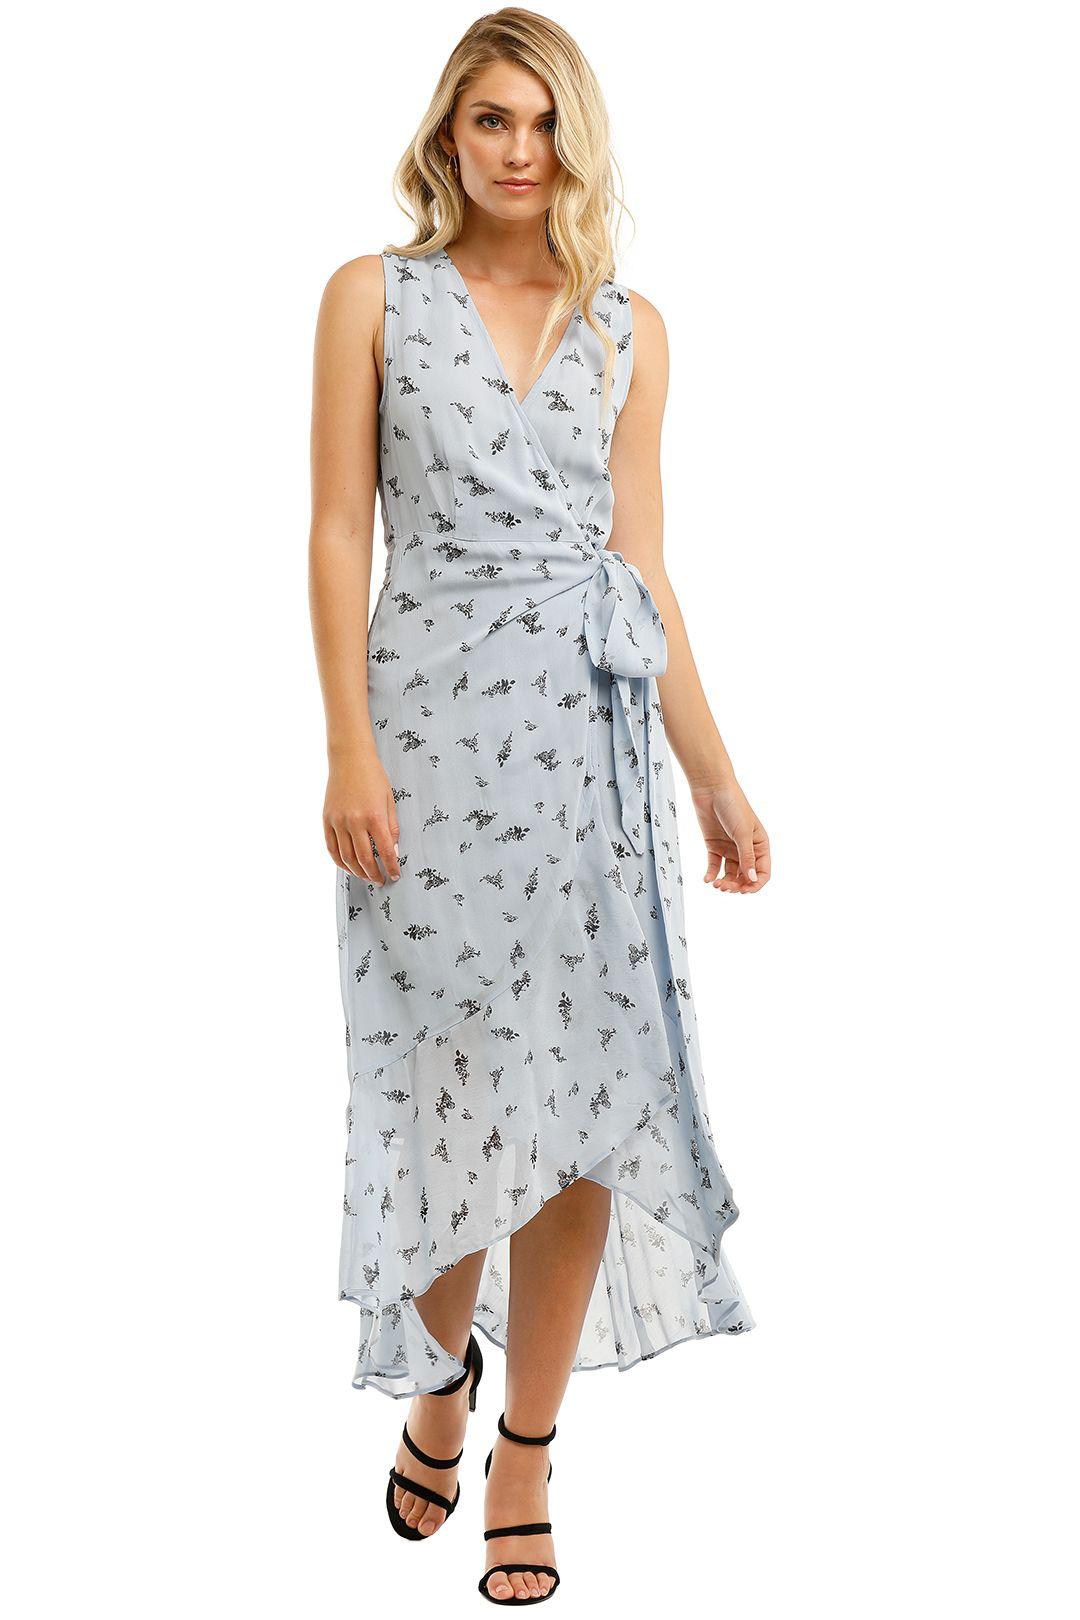 Ganni-Printed-Georgette-Sleeveless-Long-Dress-Brunnera-Blue-Front